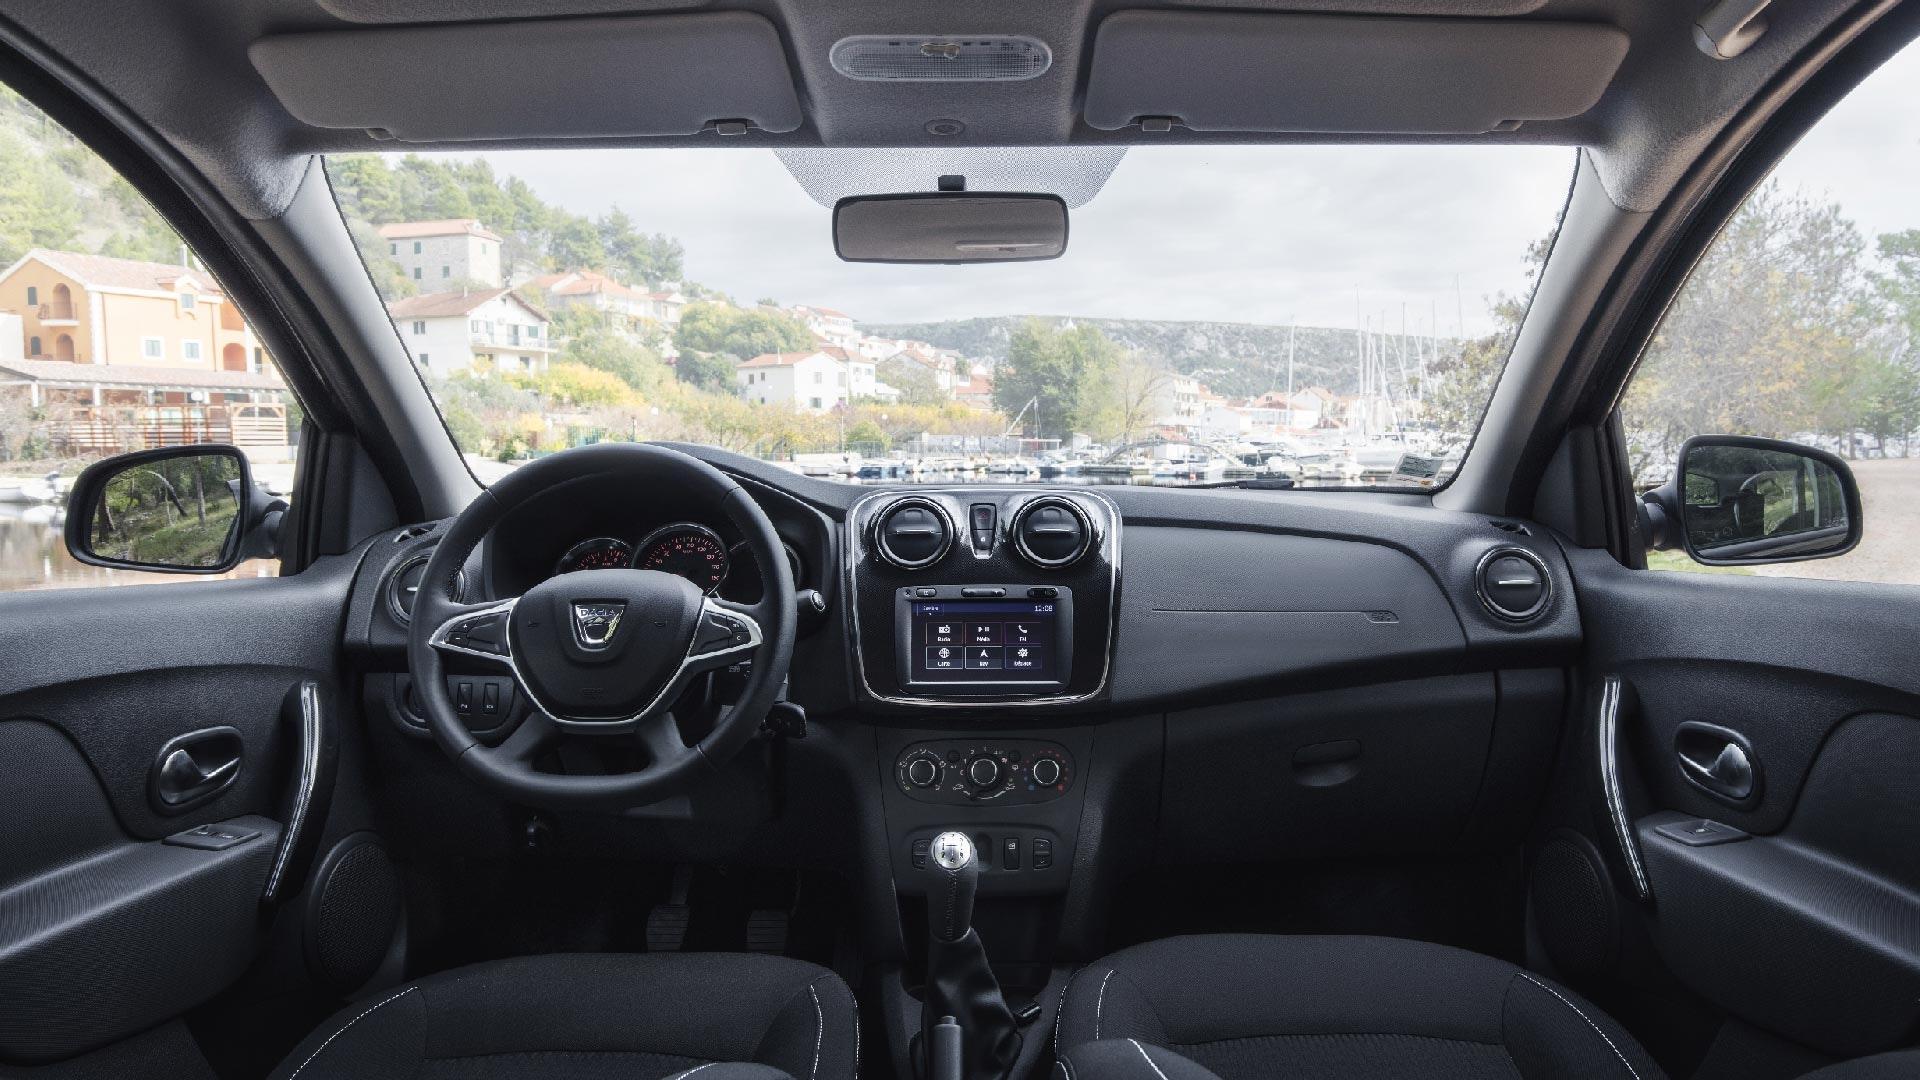 Dacia Sandero interiør